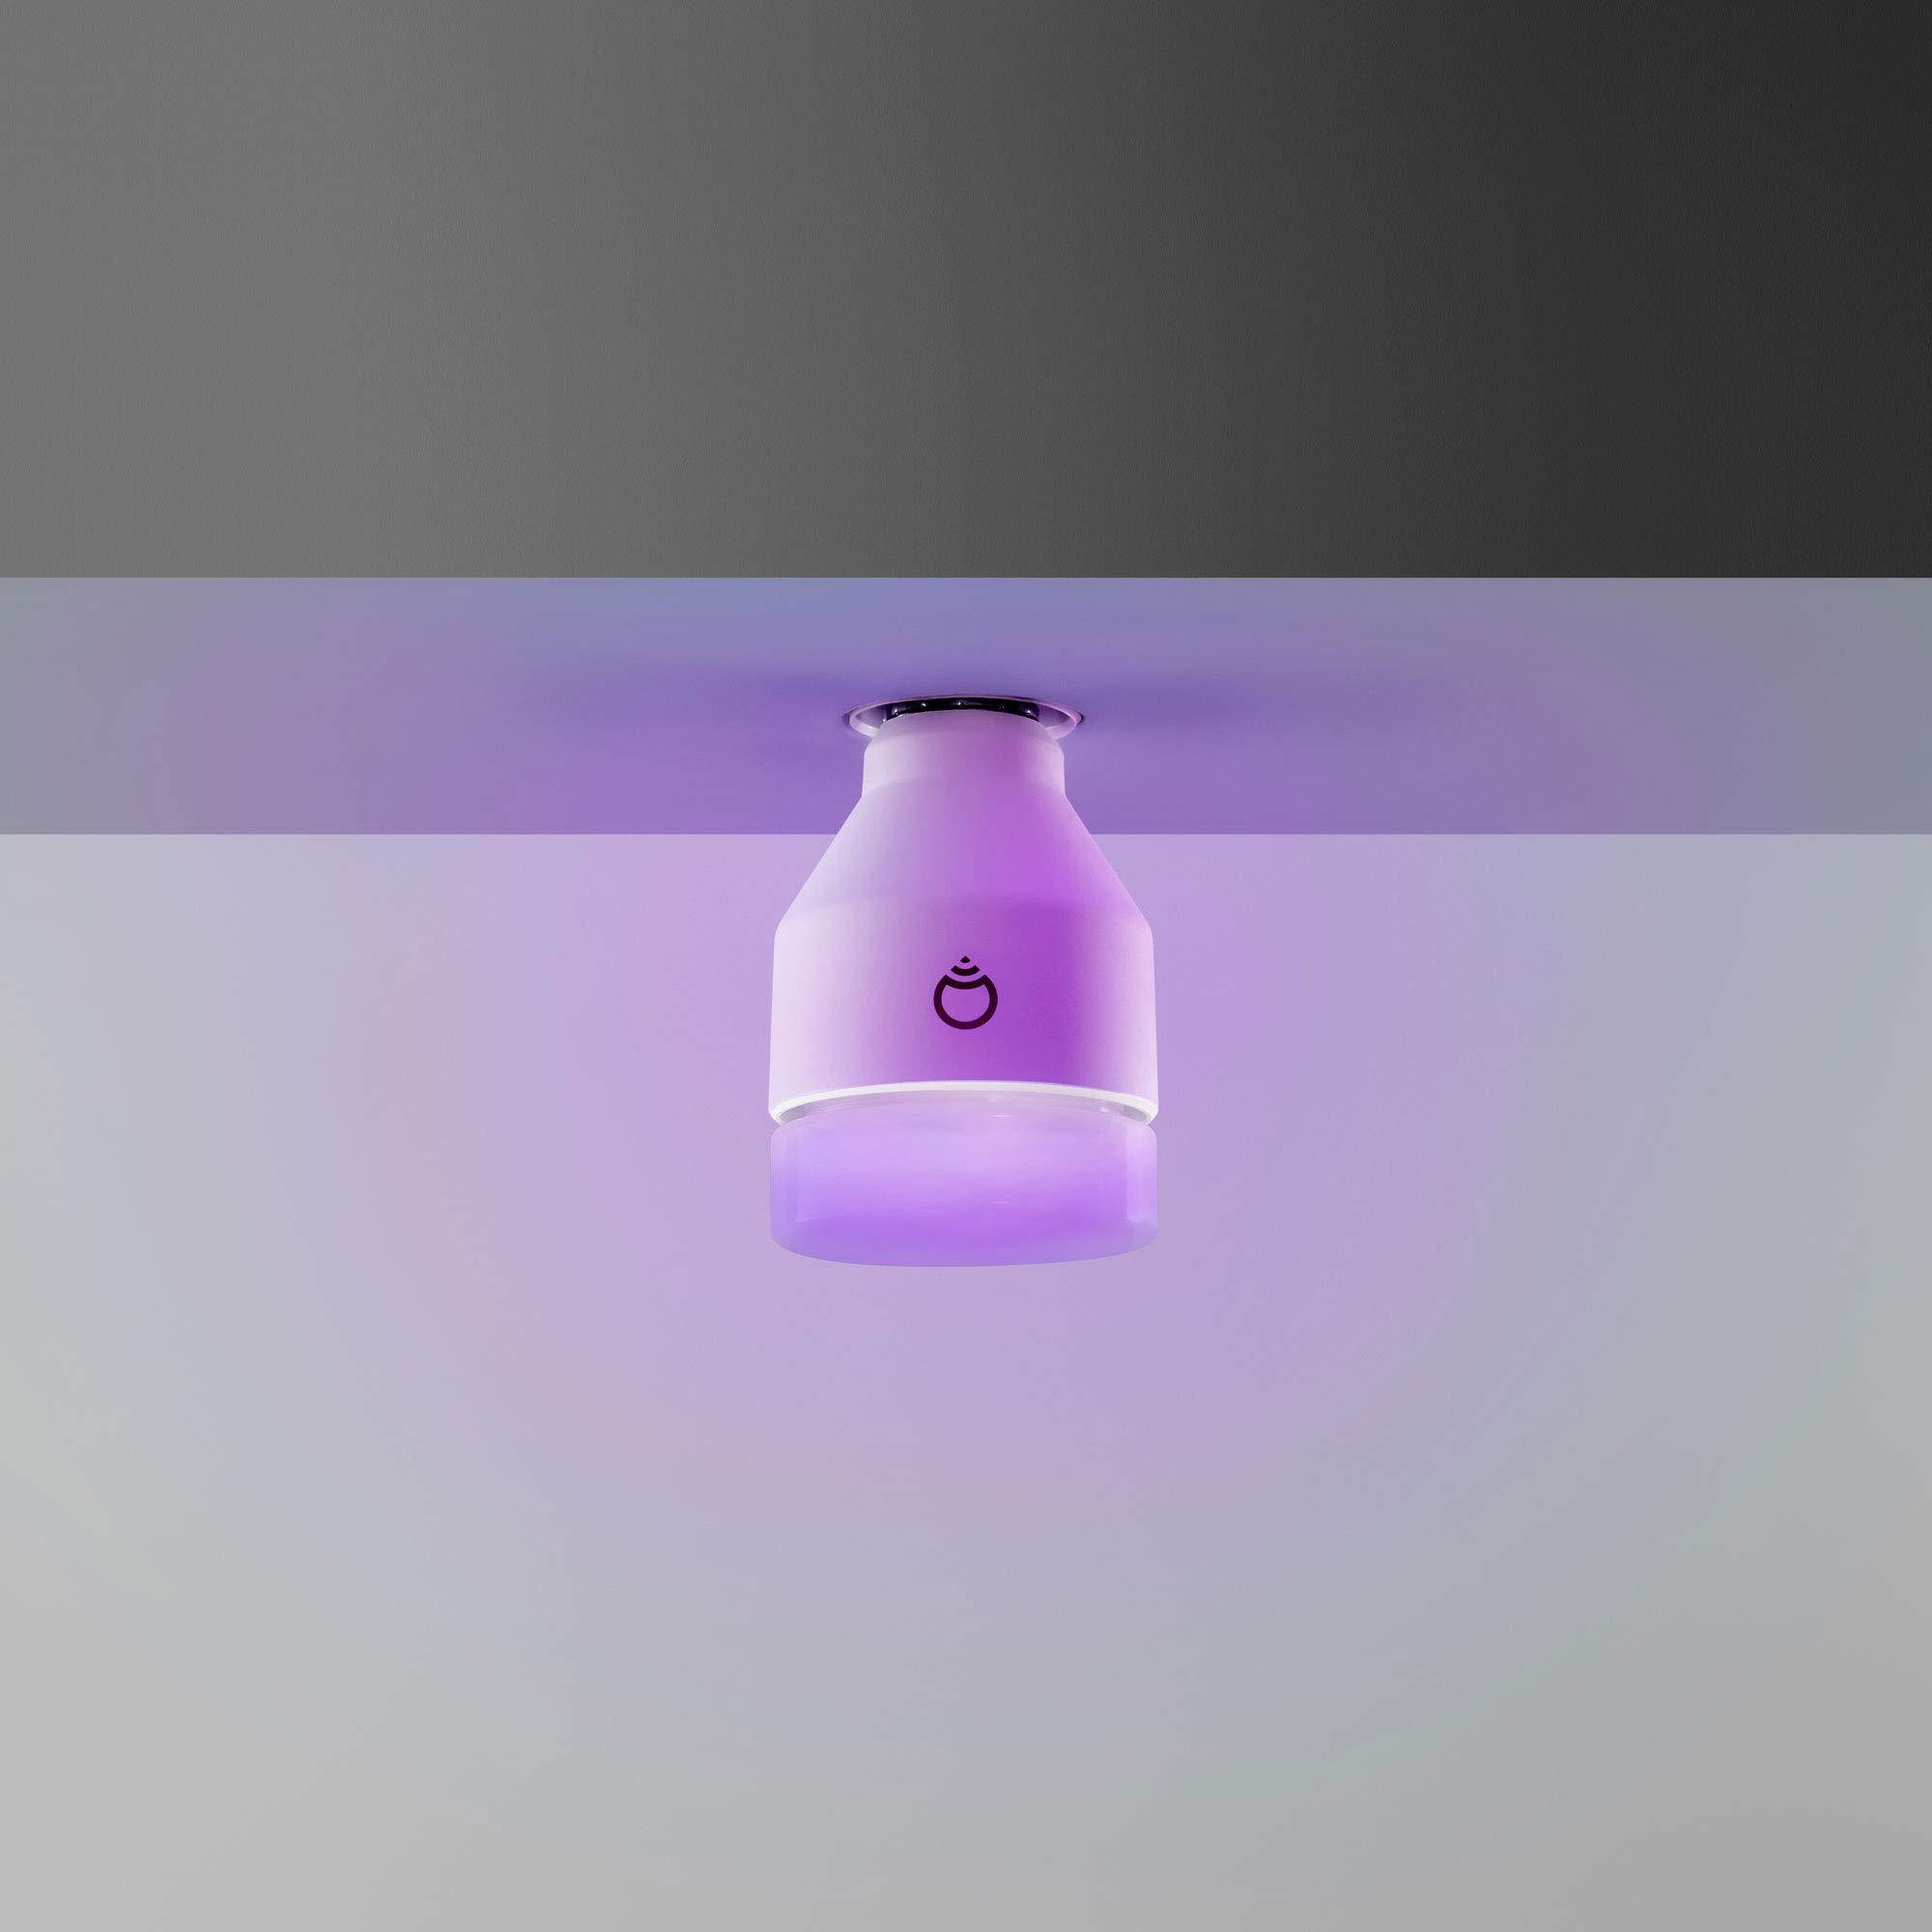 galleon lifx a19 wi fi smart led light bulb adjustable multicolor dimmable no hub. Black Bedroom Furniture Sets. Home Design Ideas